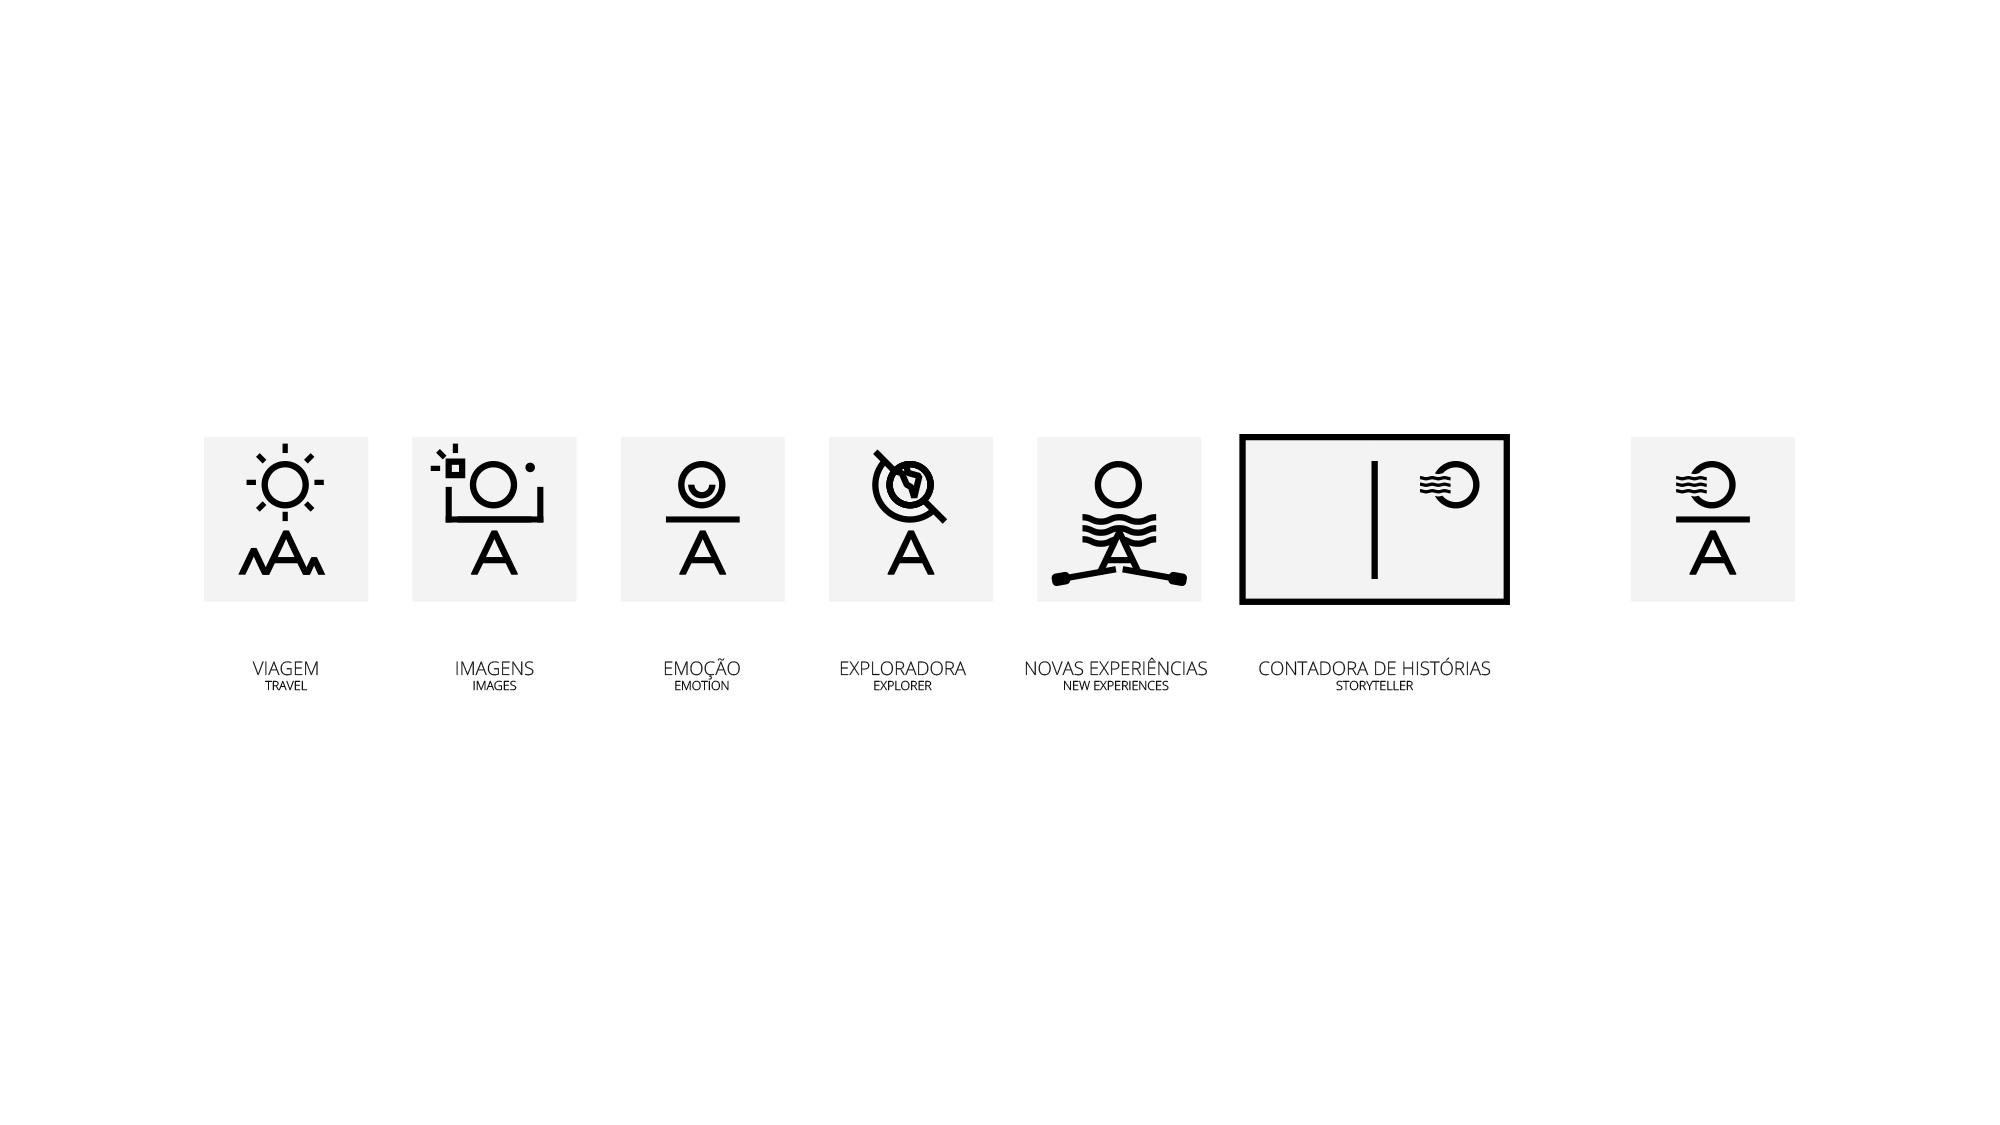 Simbologia do logo Odyssea